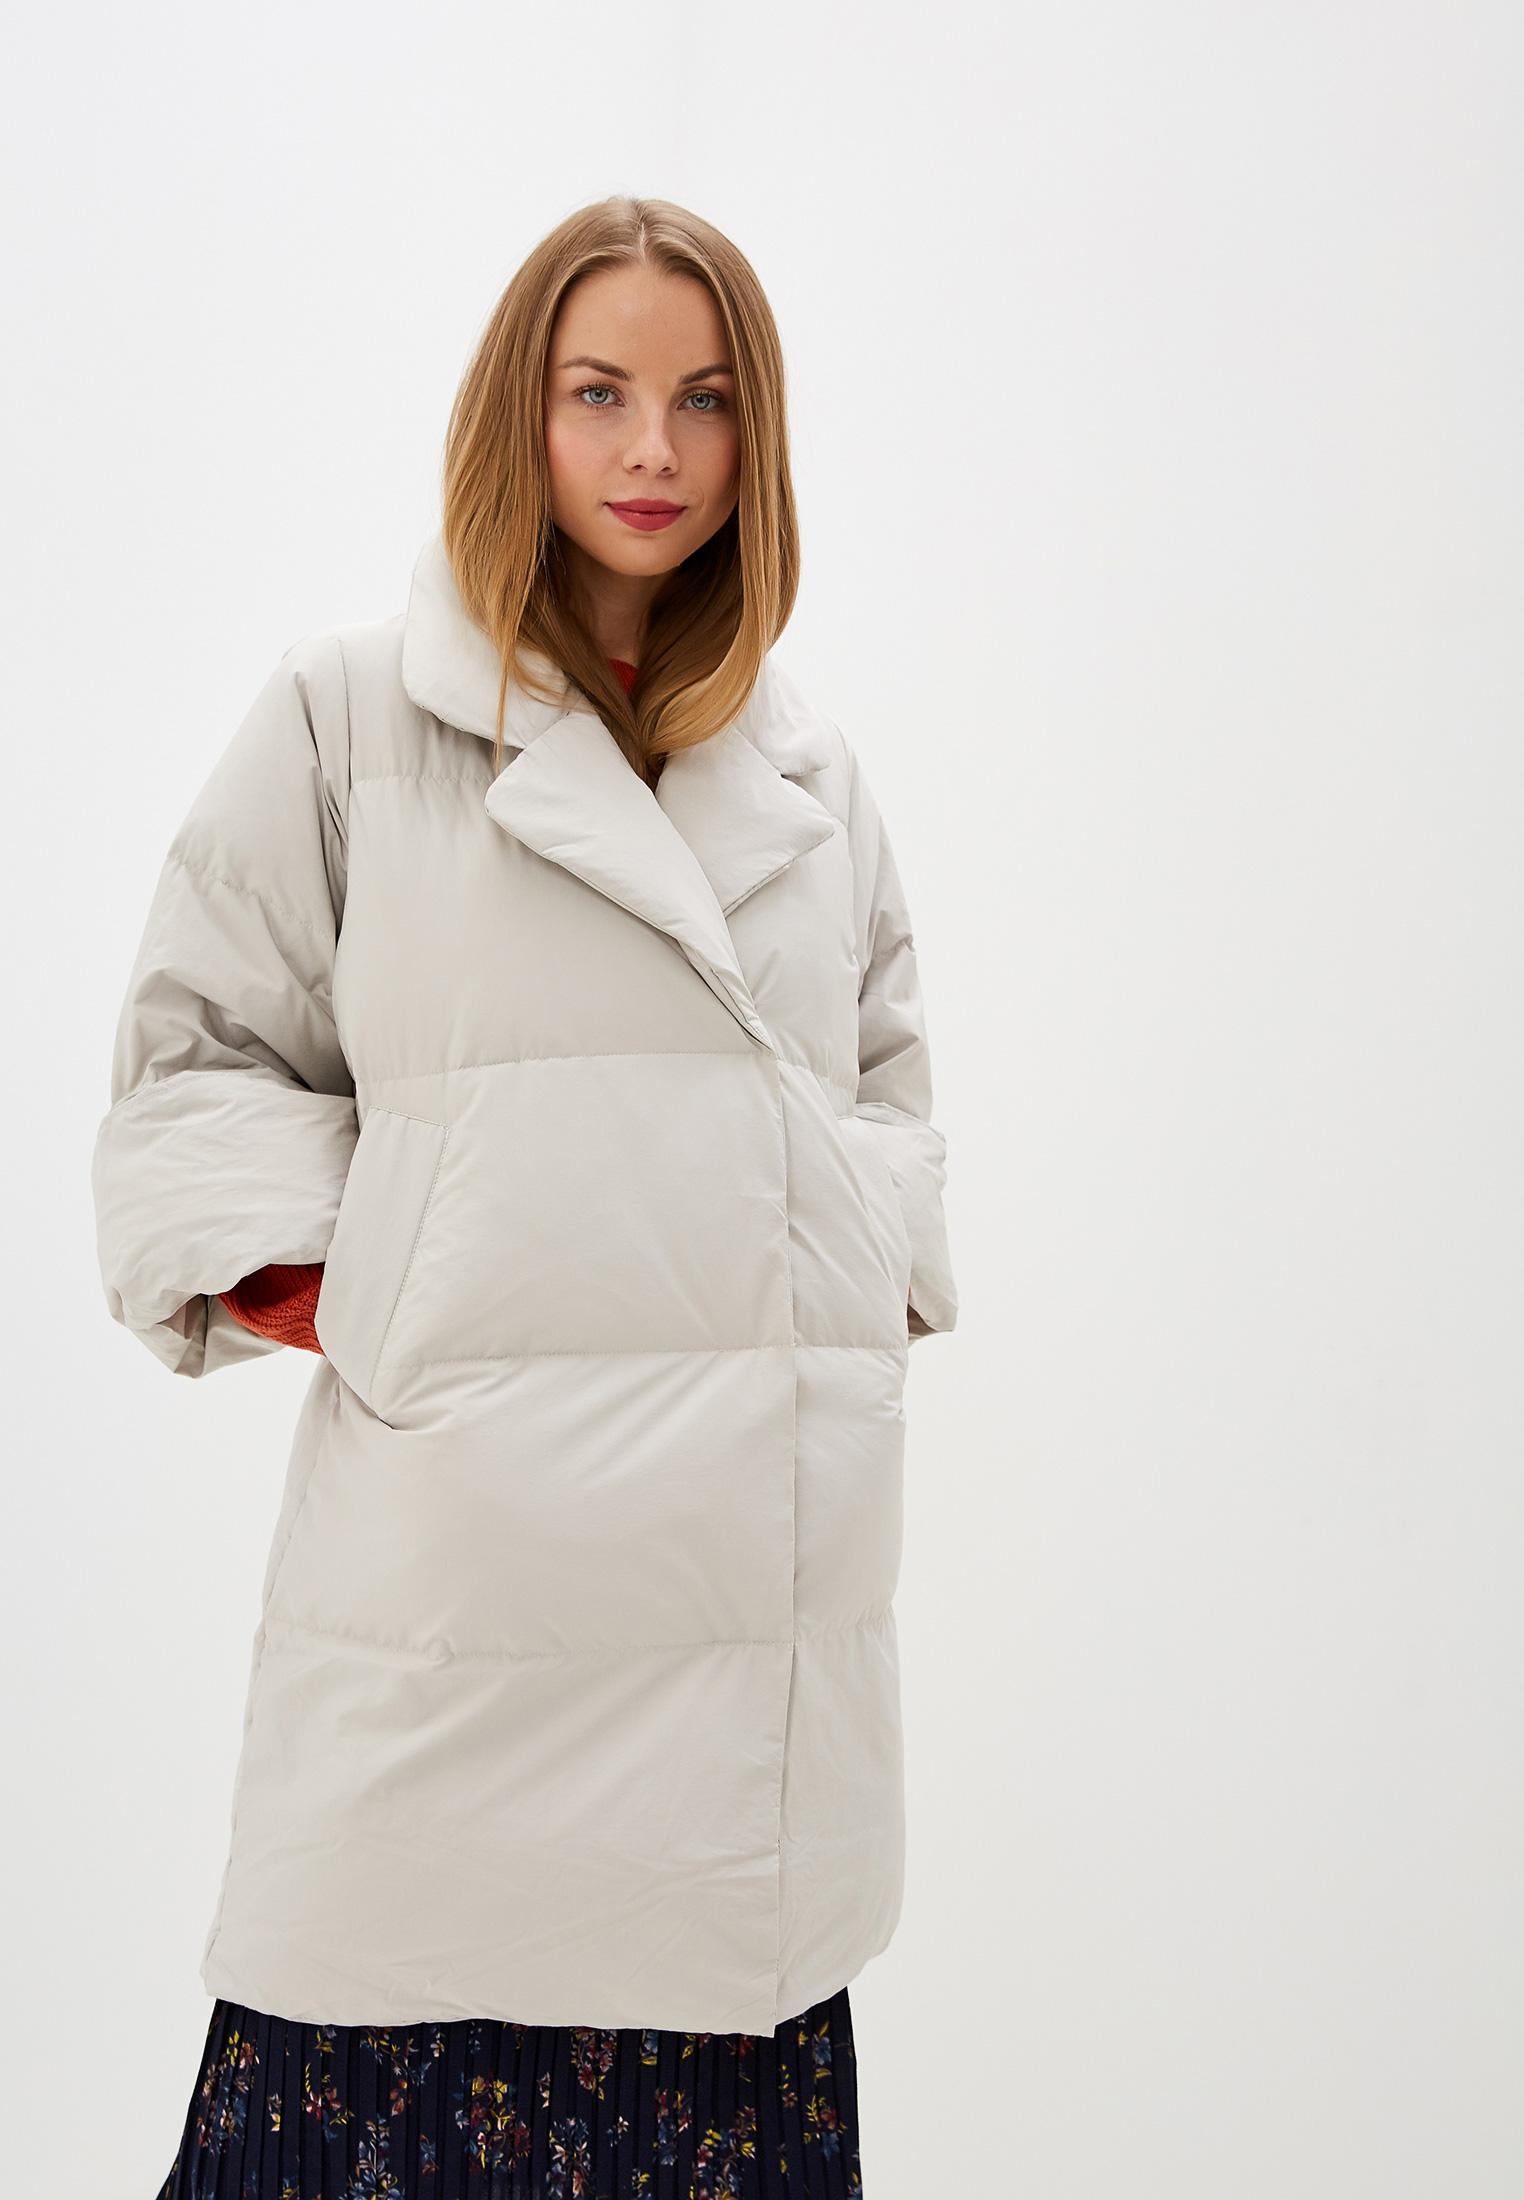 Пуховик, Savage, цвет: серый. Артикул: SA004EWGESA9. Одежда / Верхняя одежда / Пуховики и зимние куртки